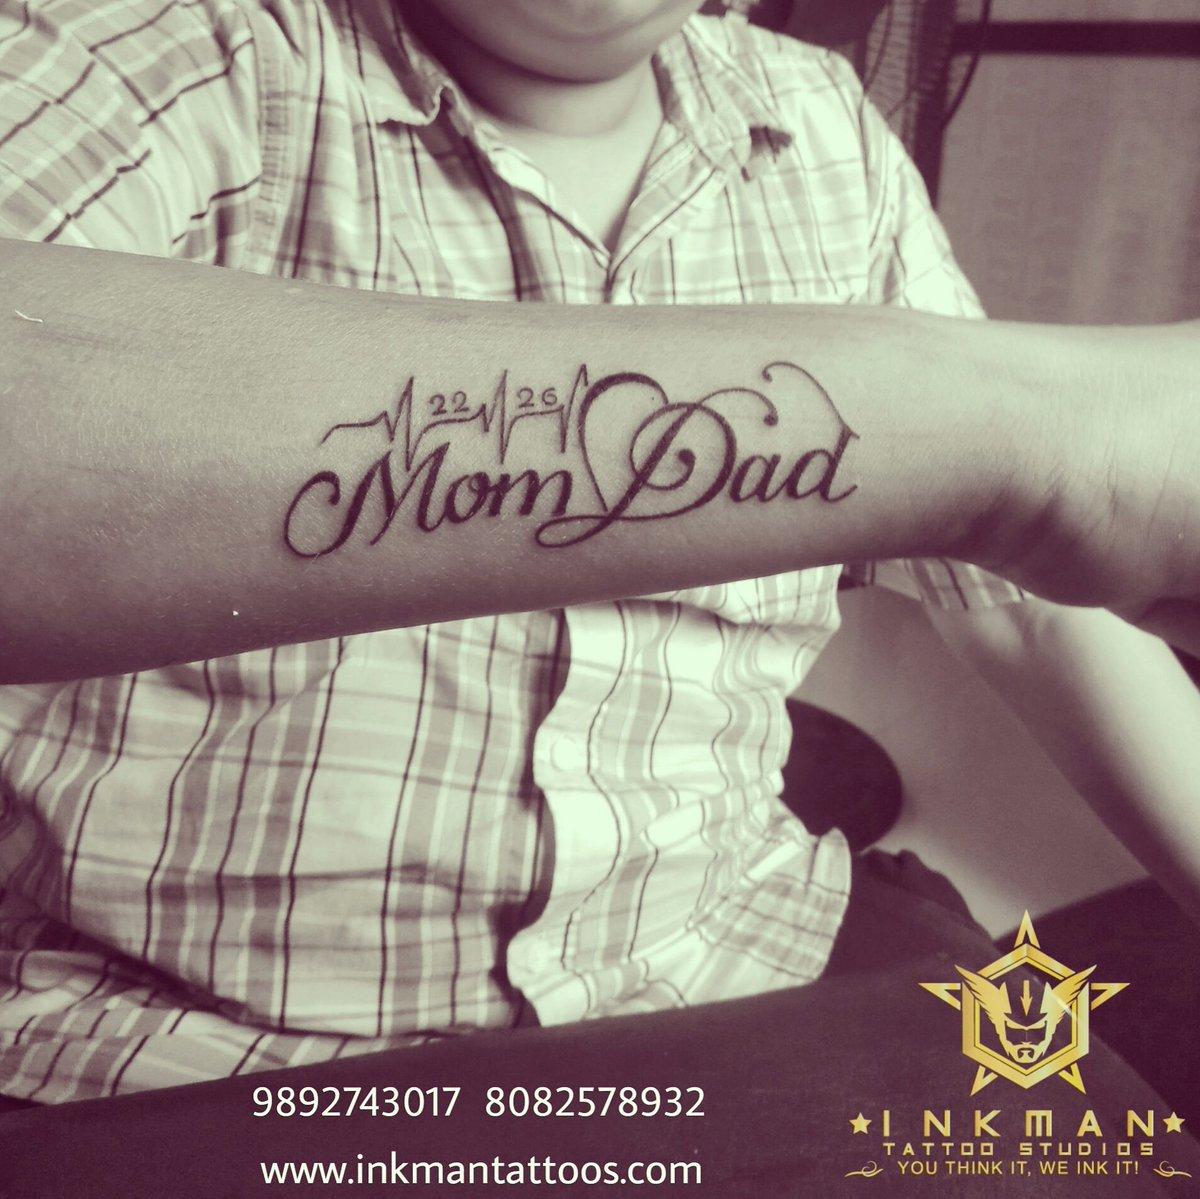 564872898 InkMan Tattoo Studio on Twitter: